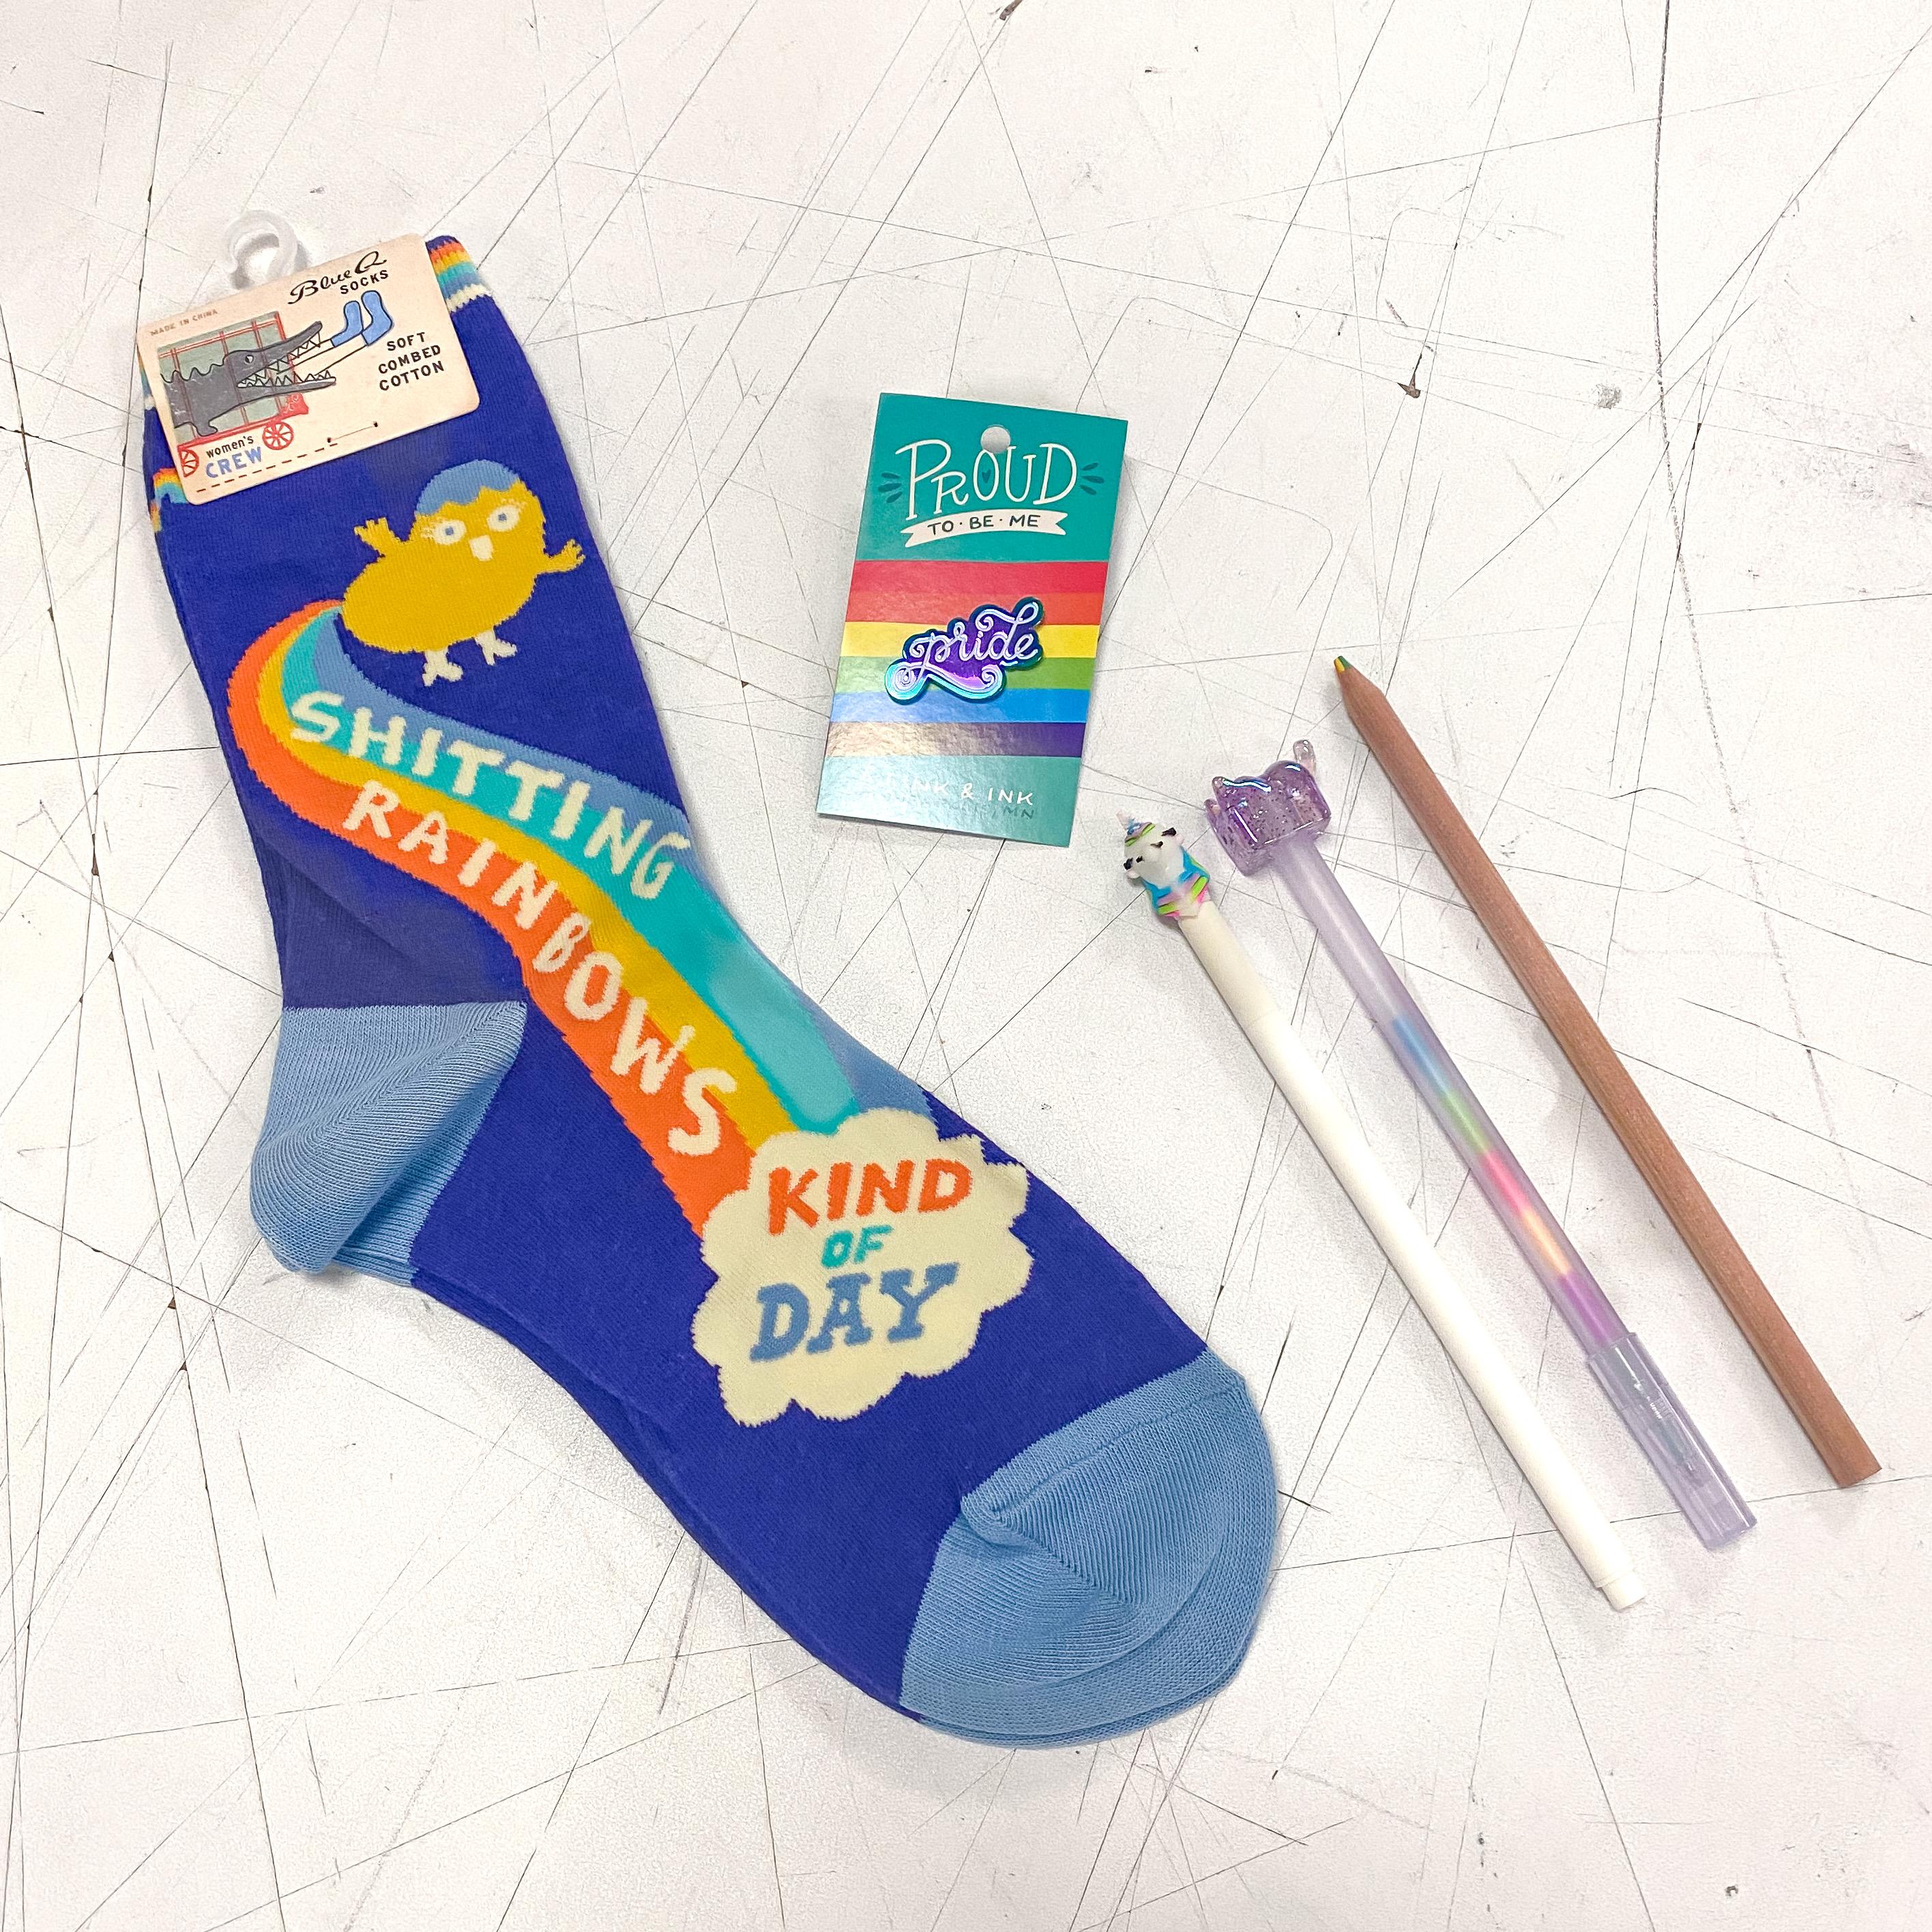 Shitting Rainbows Pride Kit!